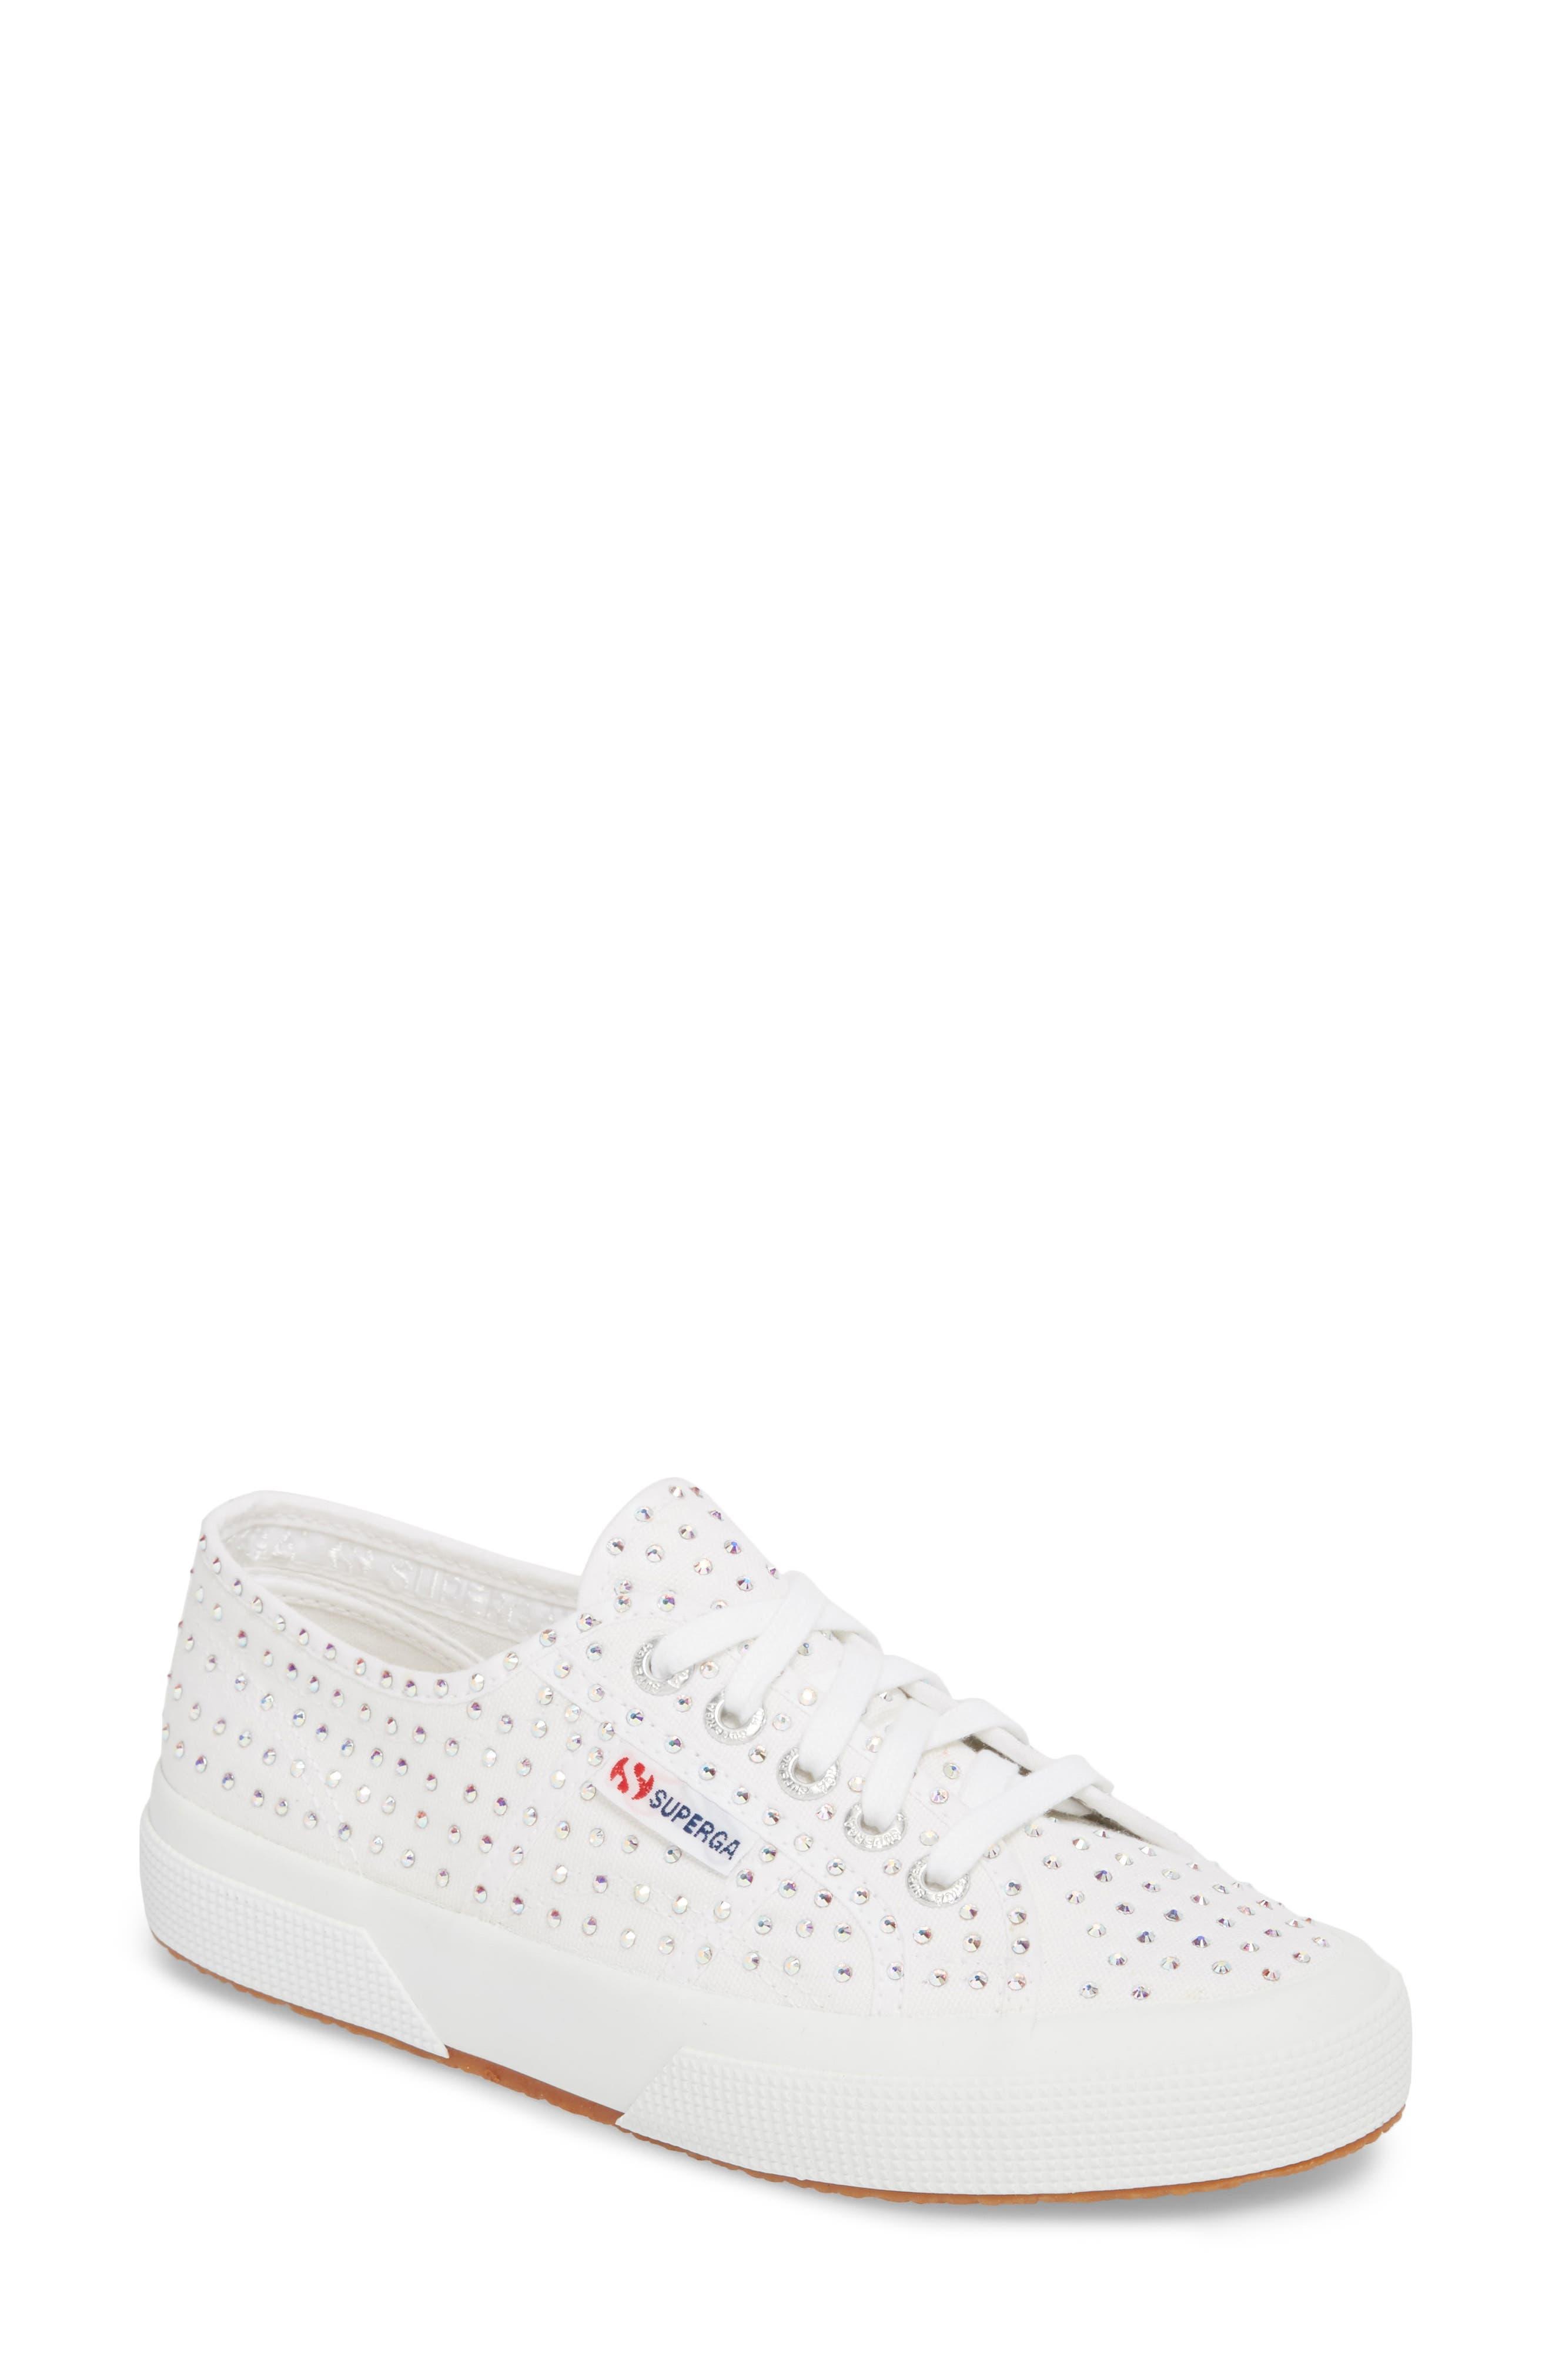 Superga 2750 Crystal Sneaker (Women)